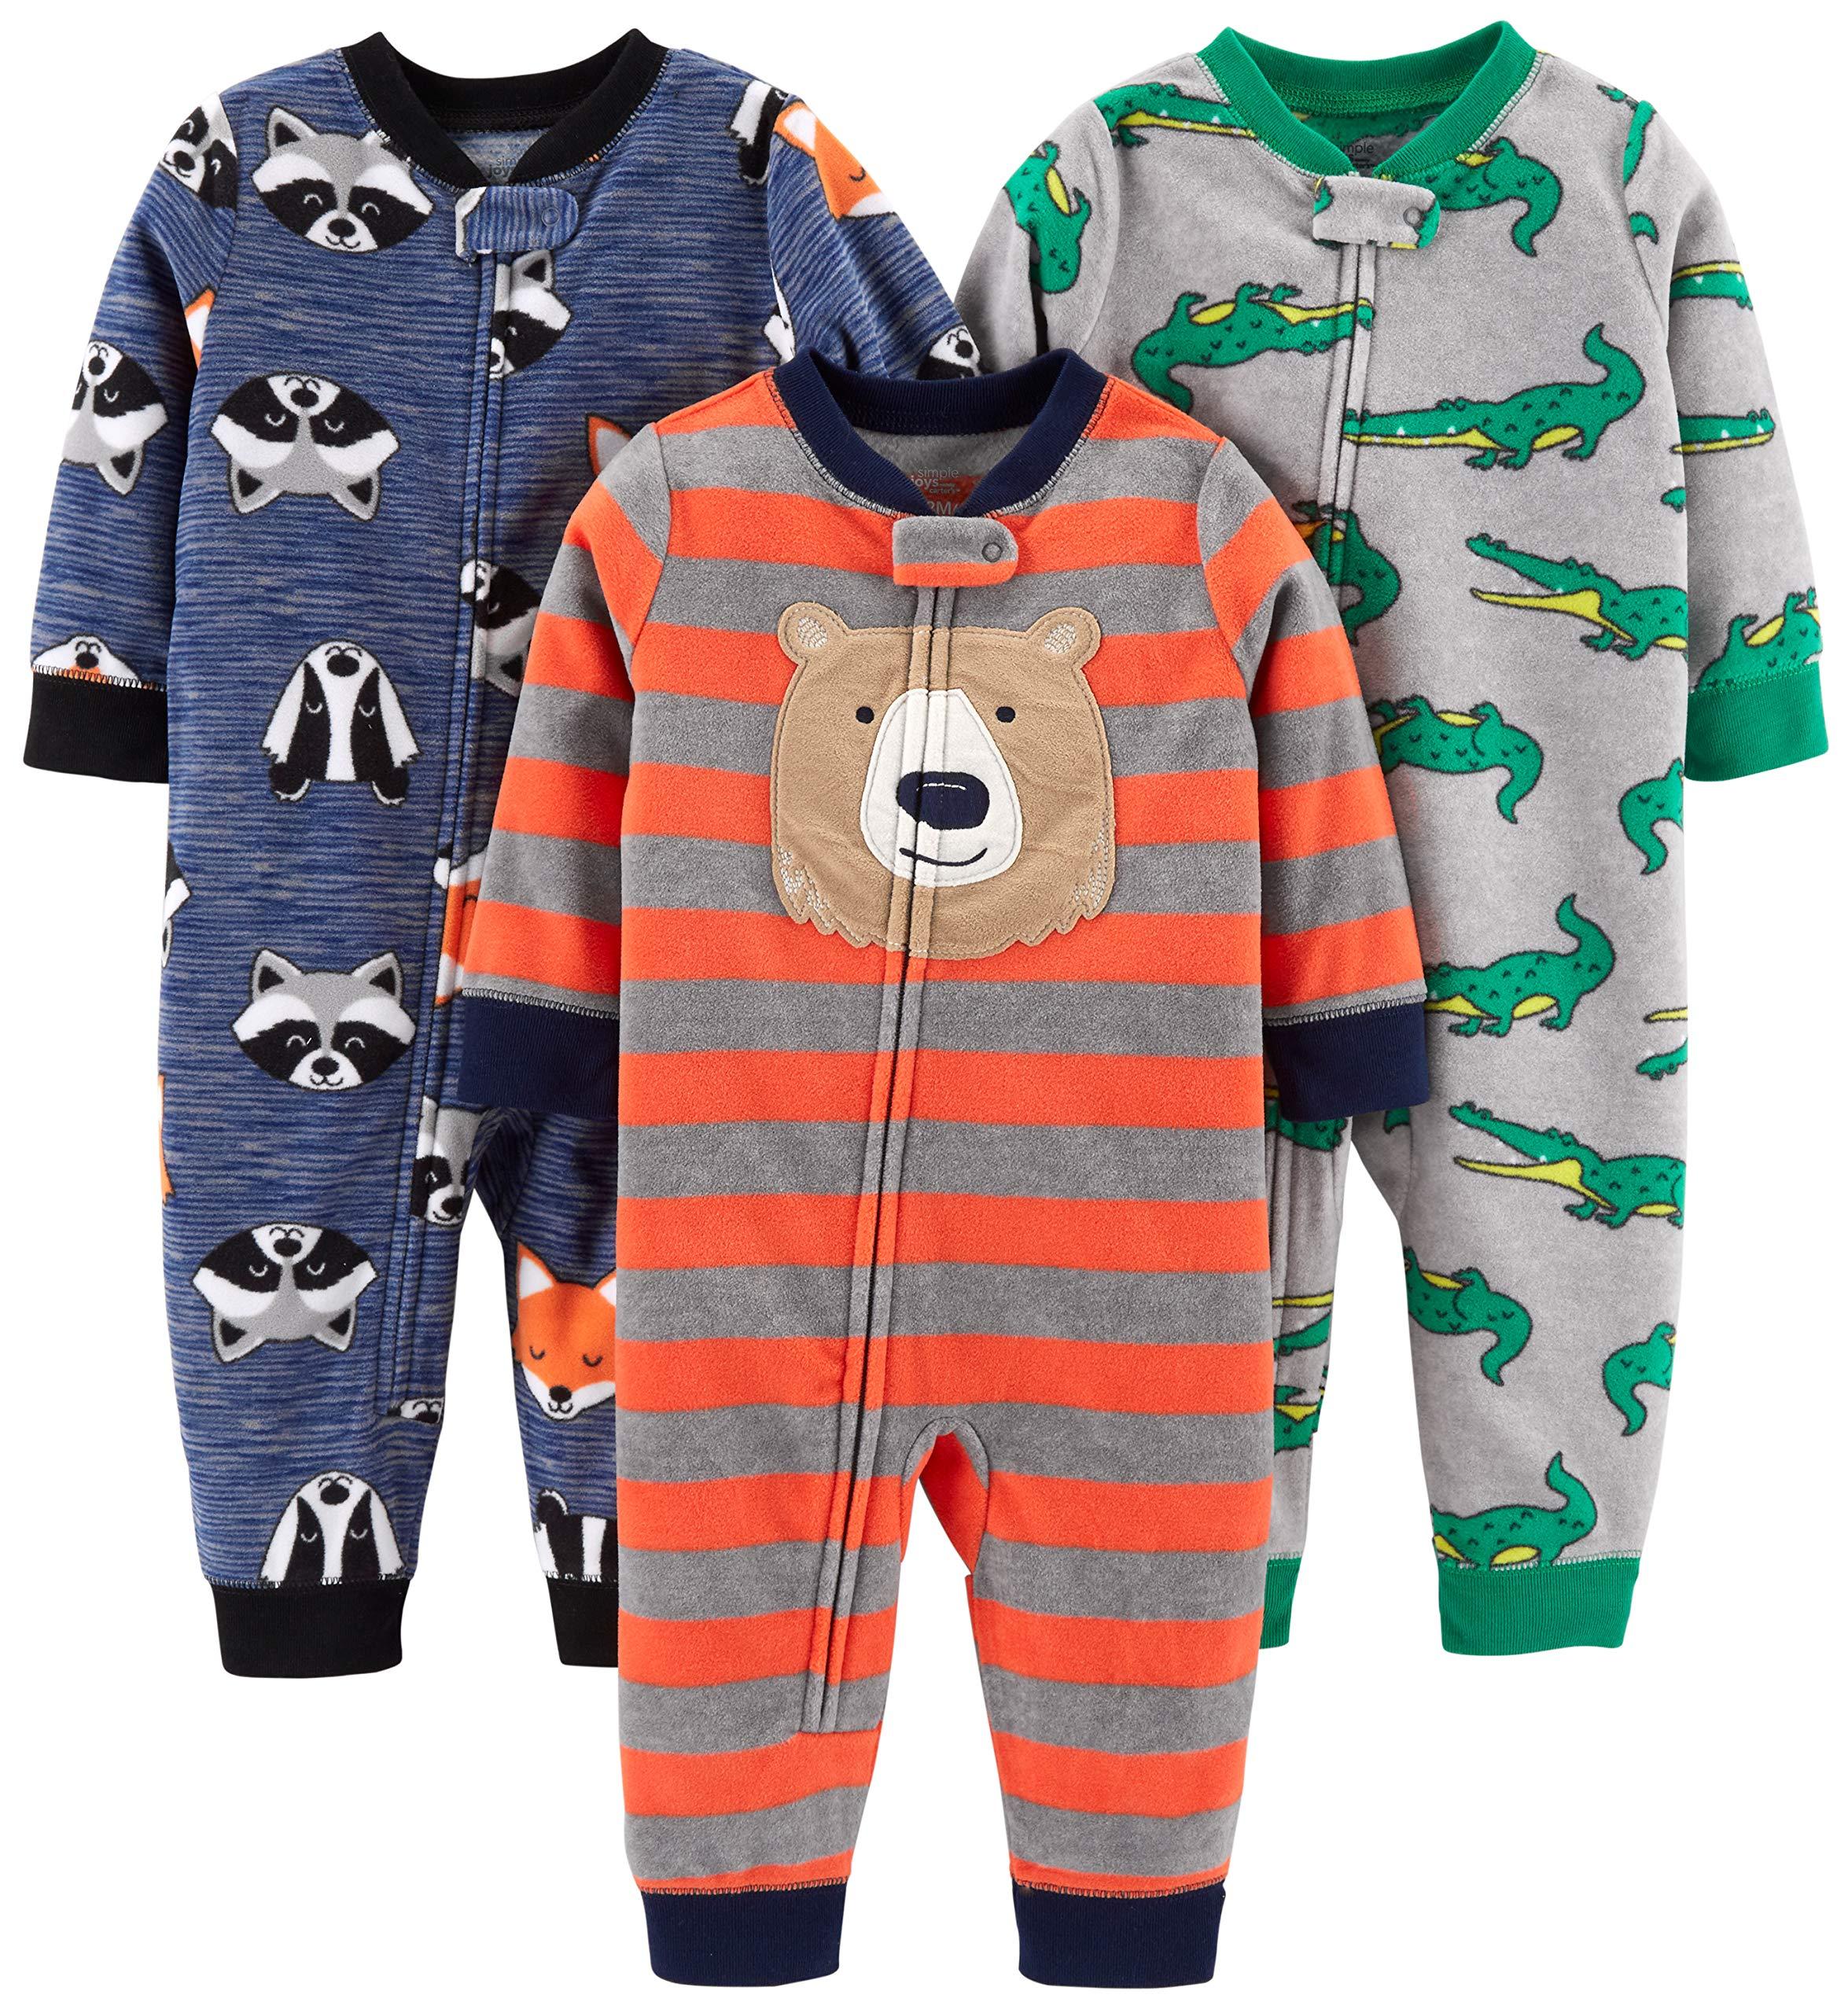 Simple Joys by Carter's Boys' 3-Pack Loose Fit Flame Resistant Fleece Footless Pajamas, Bear/Alligator/Fox/Racoon, 24 Months